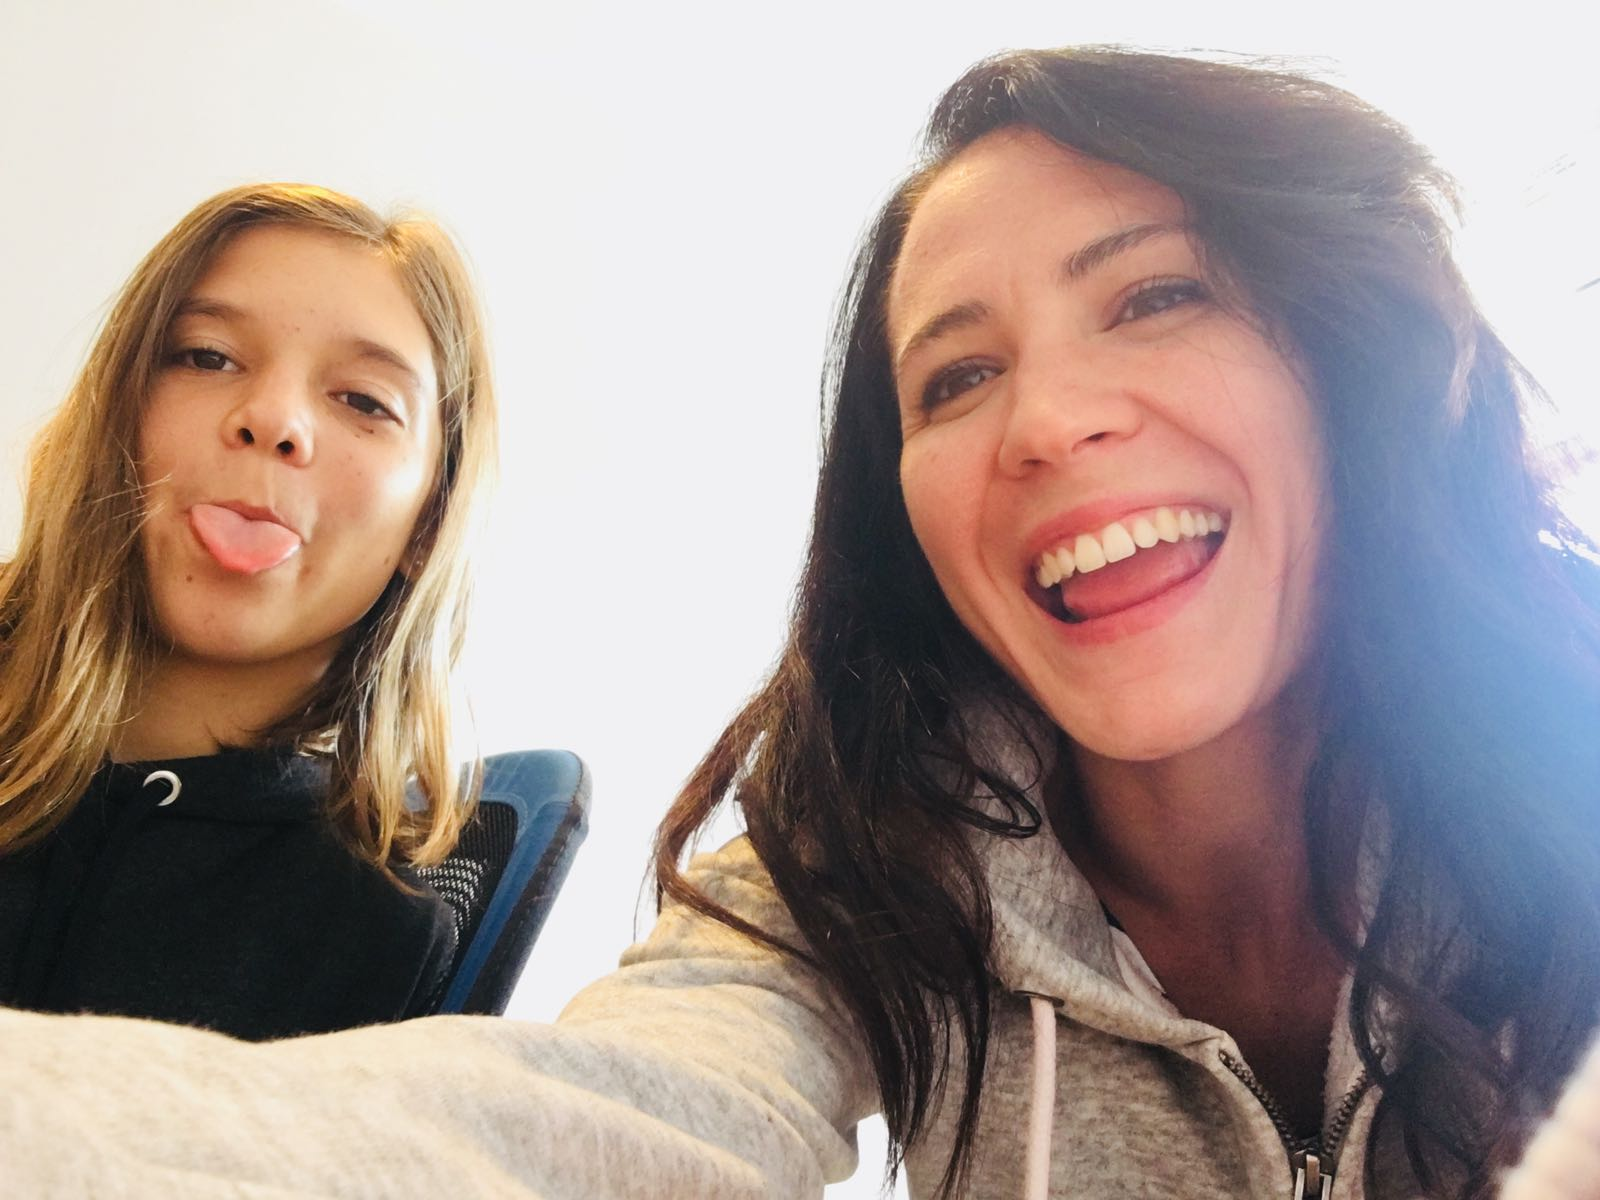 Chloe and Tammy